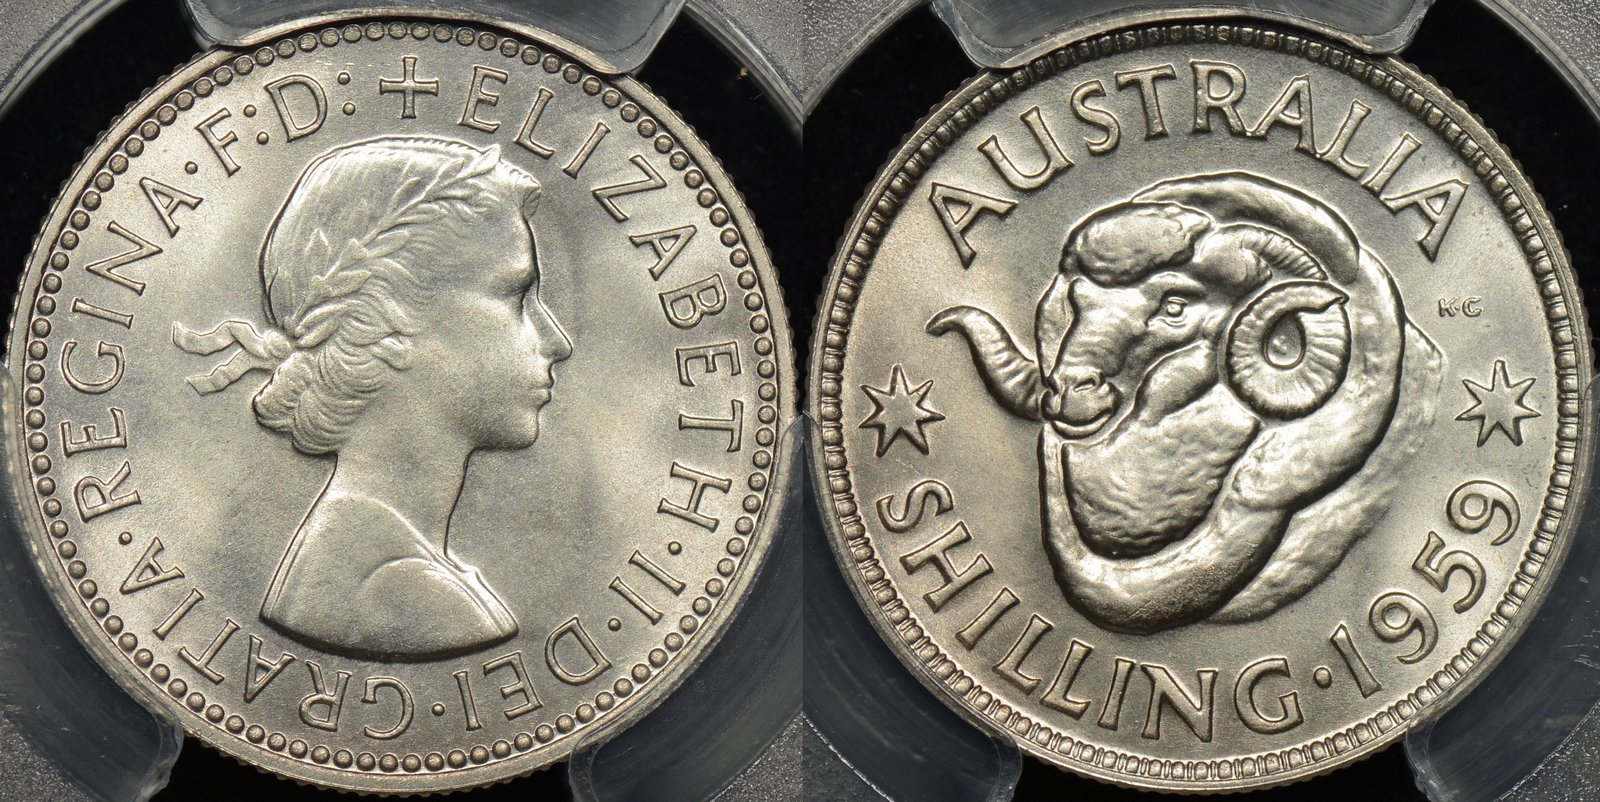 AUSTRALIA 1959 QUEEN ELIZABETH II SILVER One Shilling 1// COIN